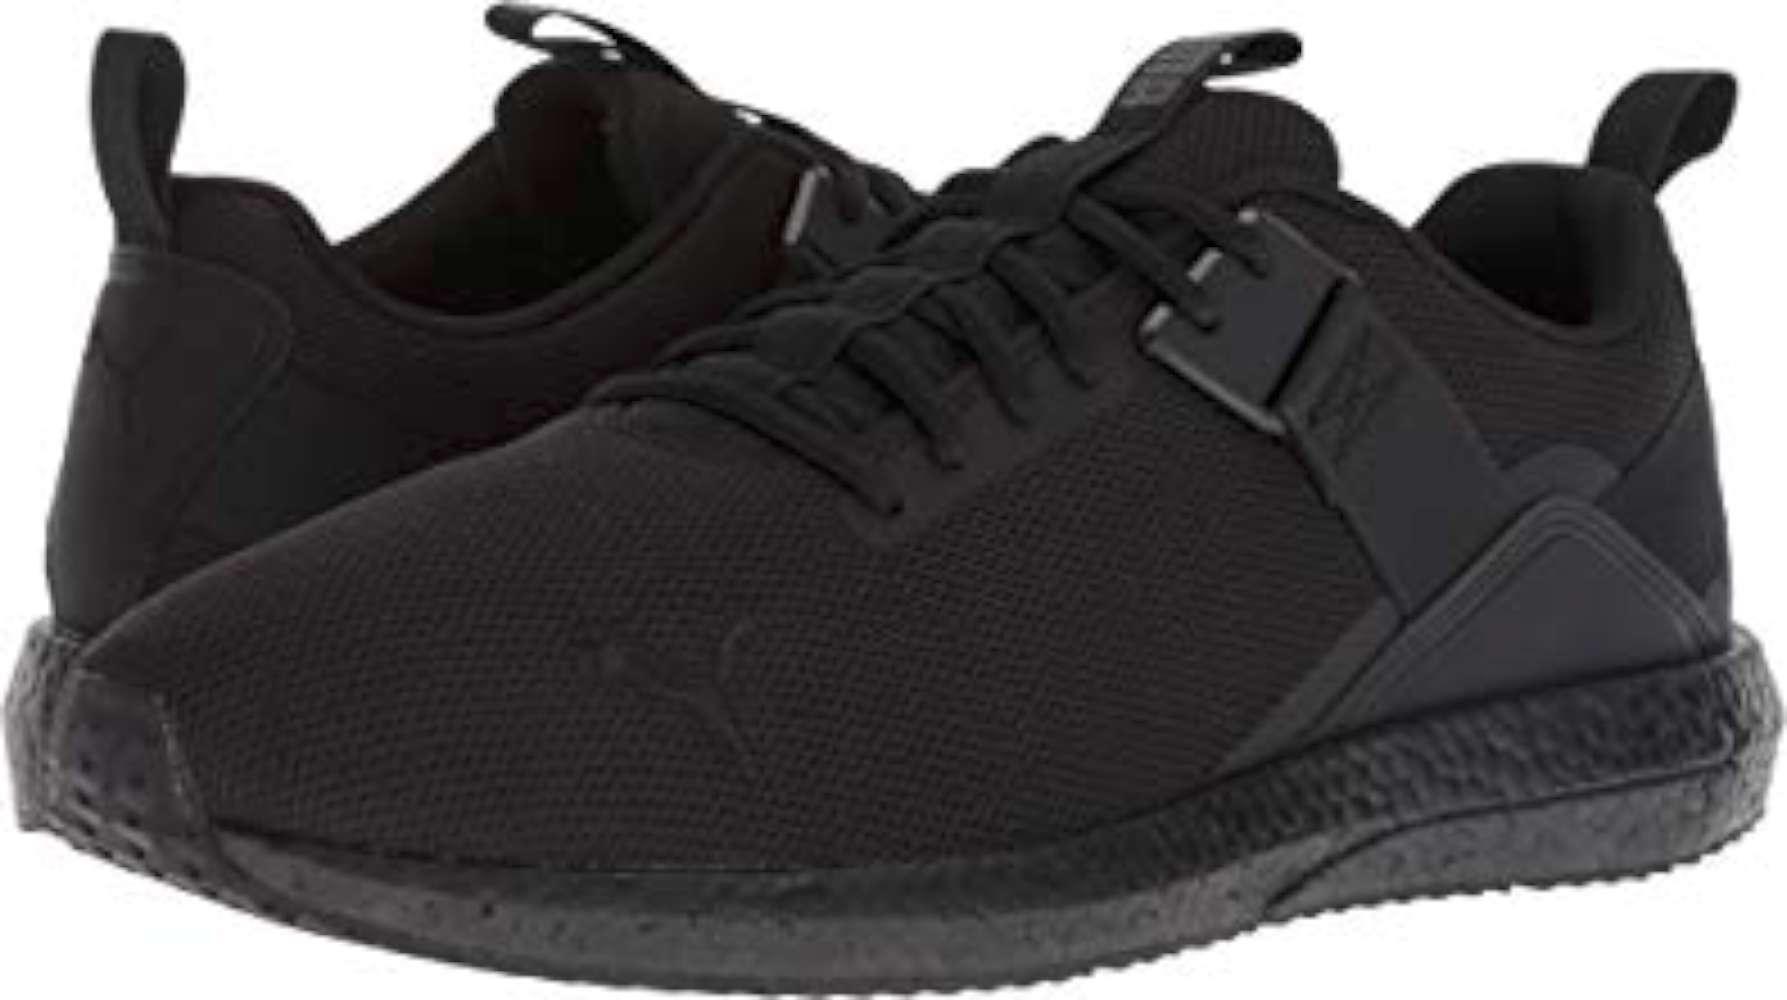 df501fc68f94f3 Puma Womens Mega NRGY Street Mesh Low Top Lace Up Tennis Shoes ...